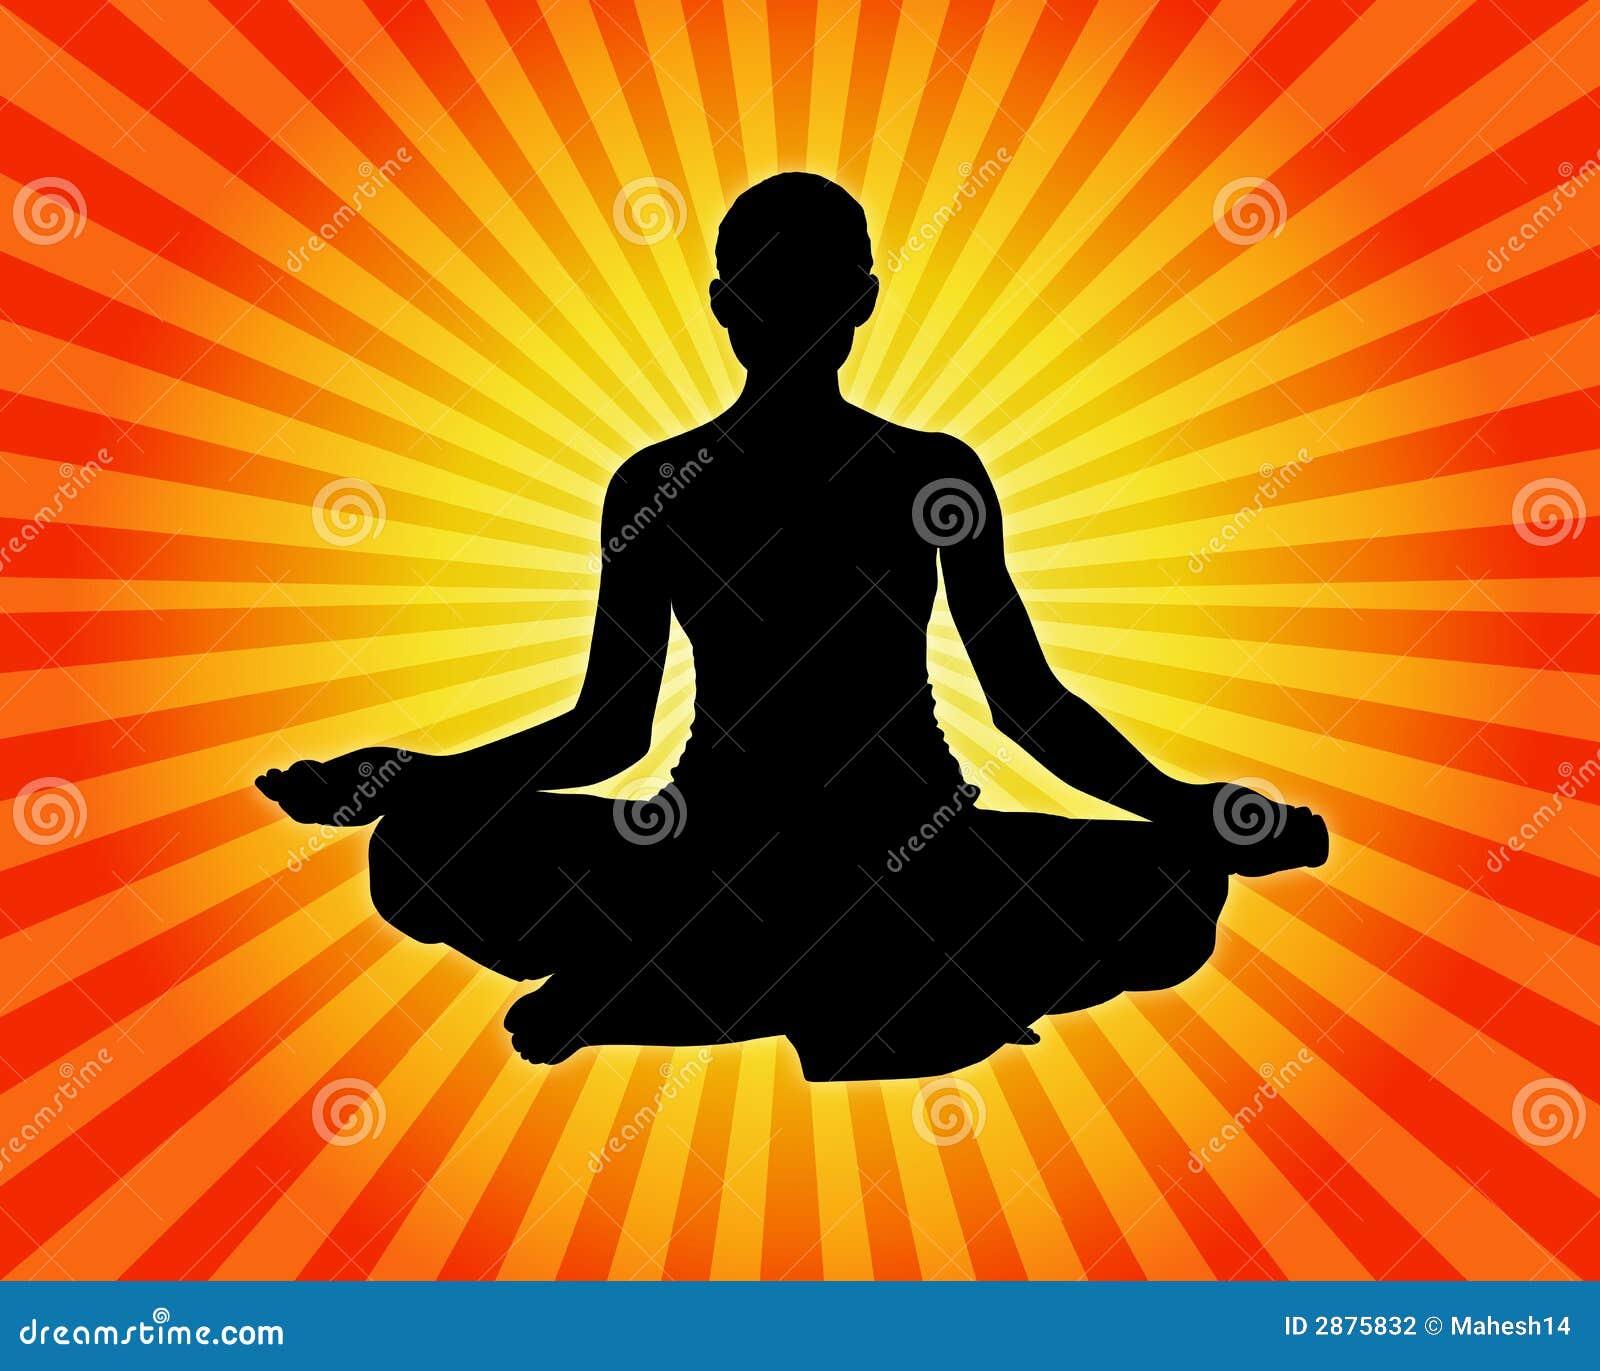 Zen Photography Water Yoga - Meditation Stoc...